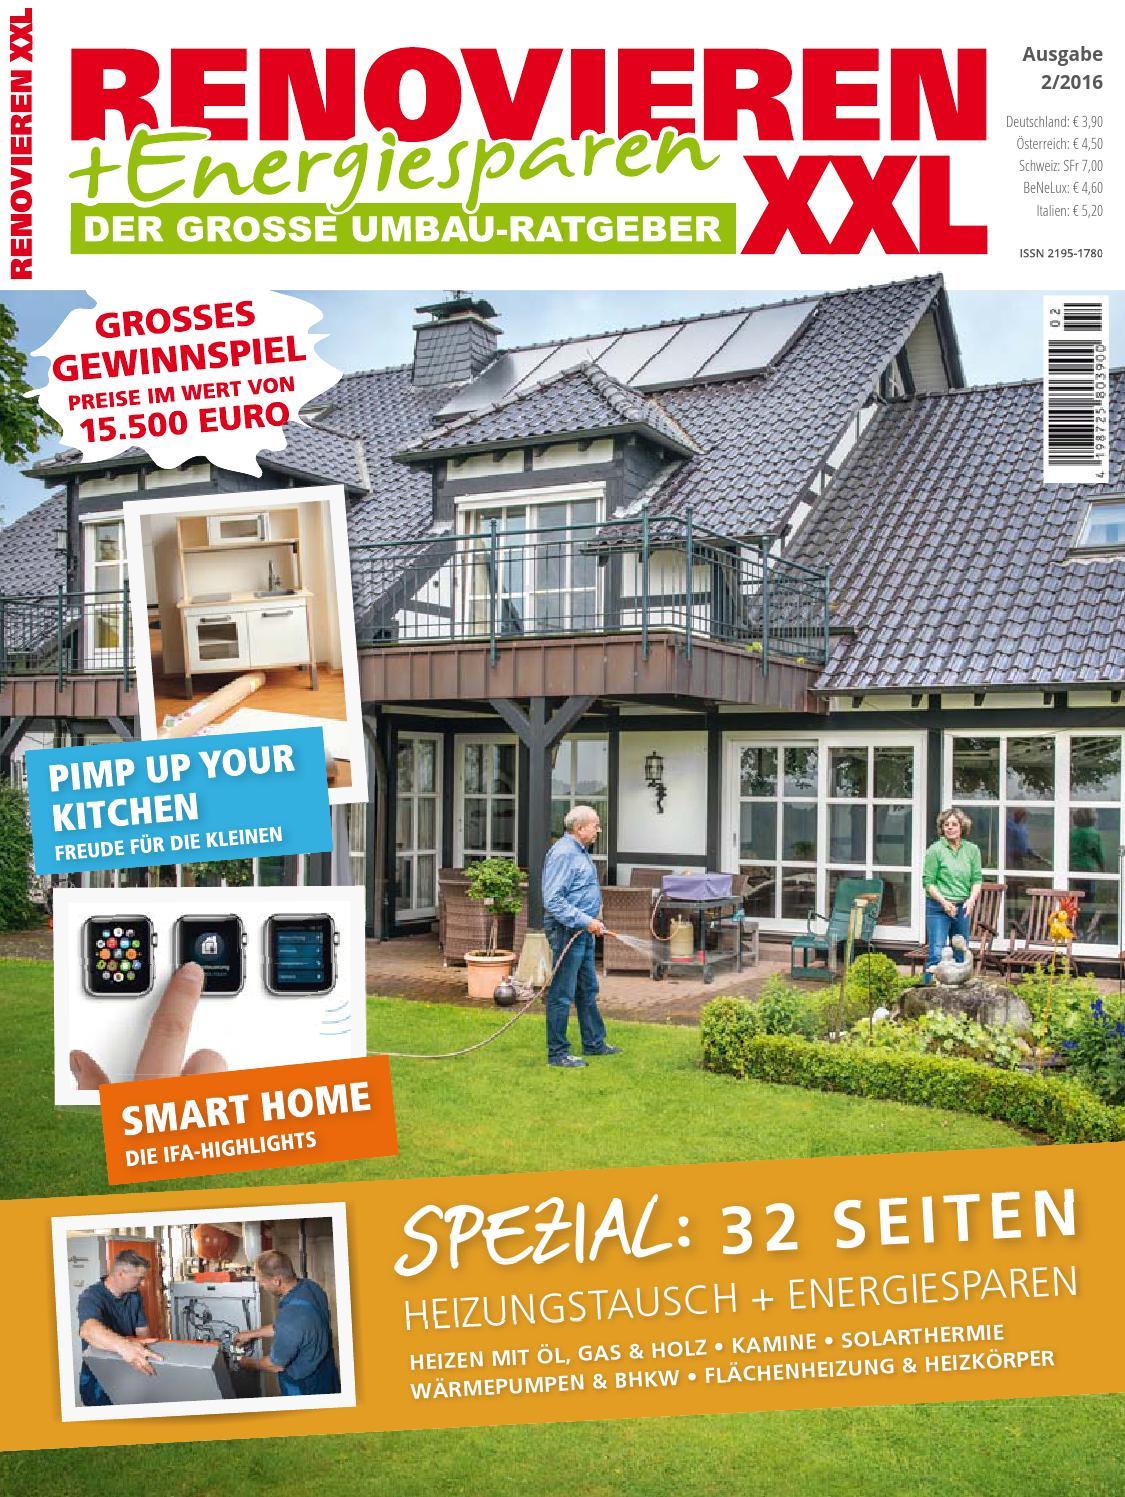 Renovieren & Energiesparen 2/2016 by Family Home Verlag GmbH - issuu